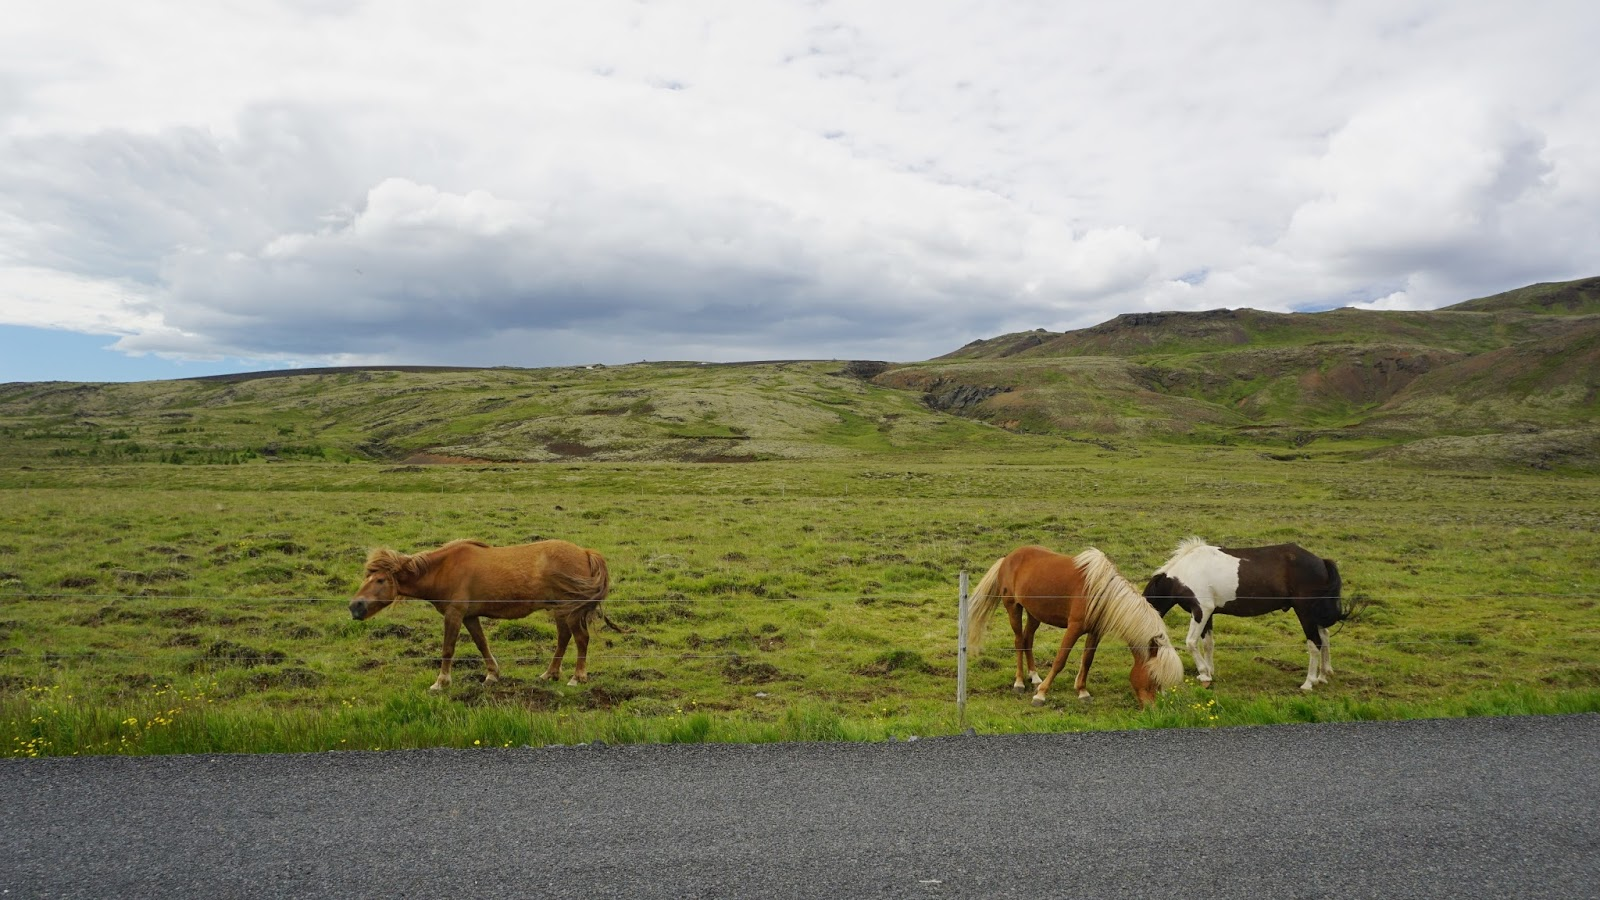 konie islandzkie, kuce islandzkie, konie, Islandia